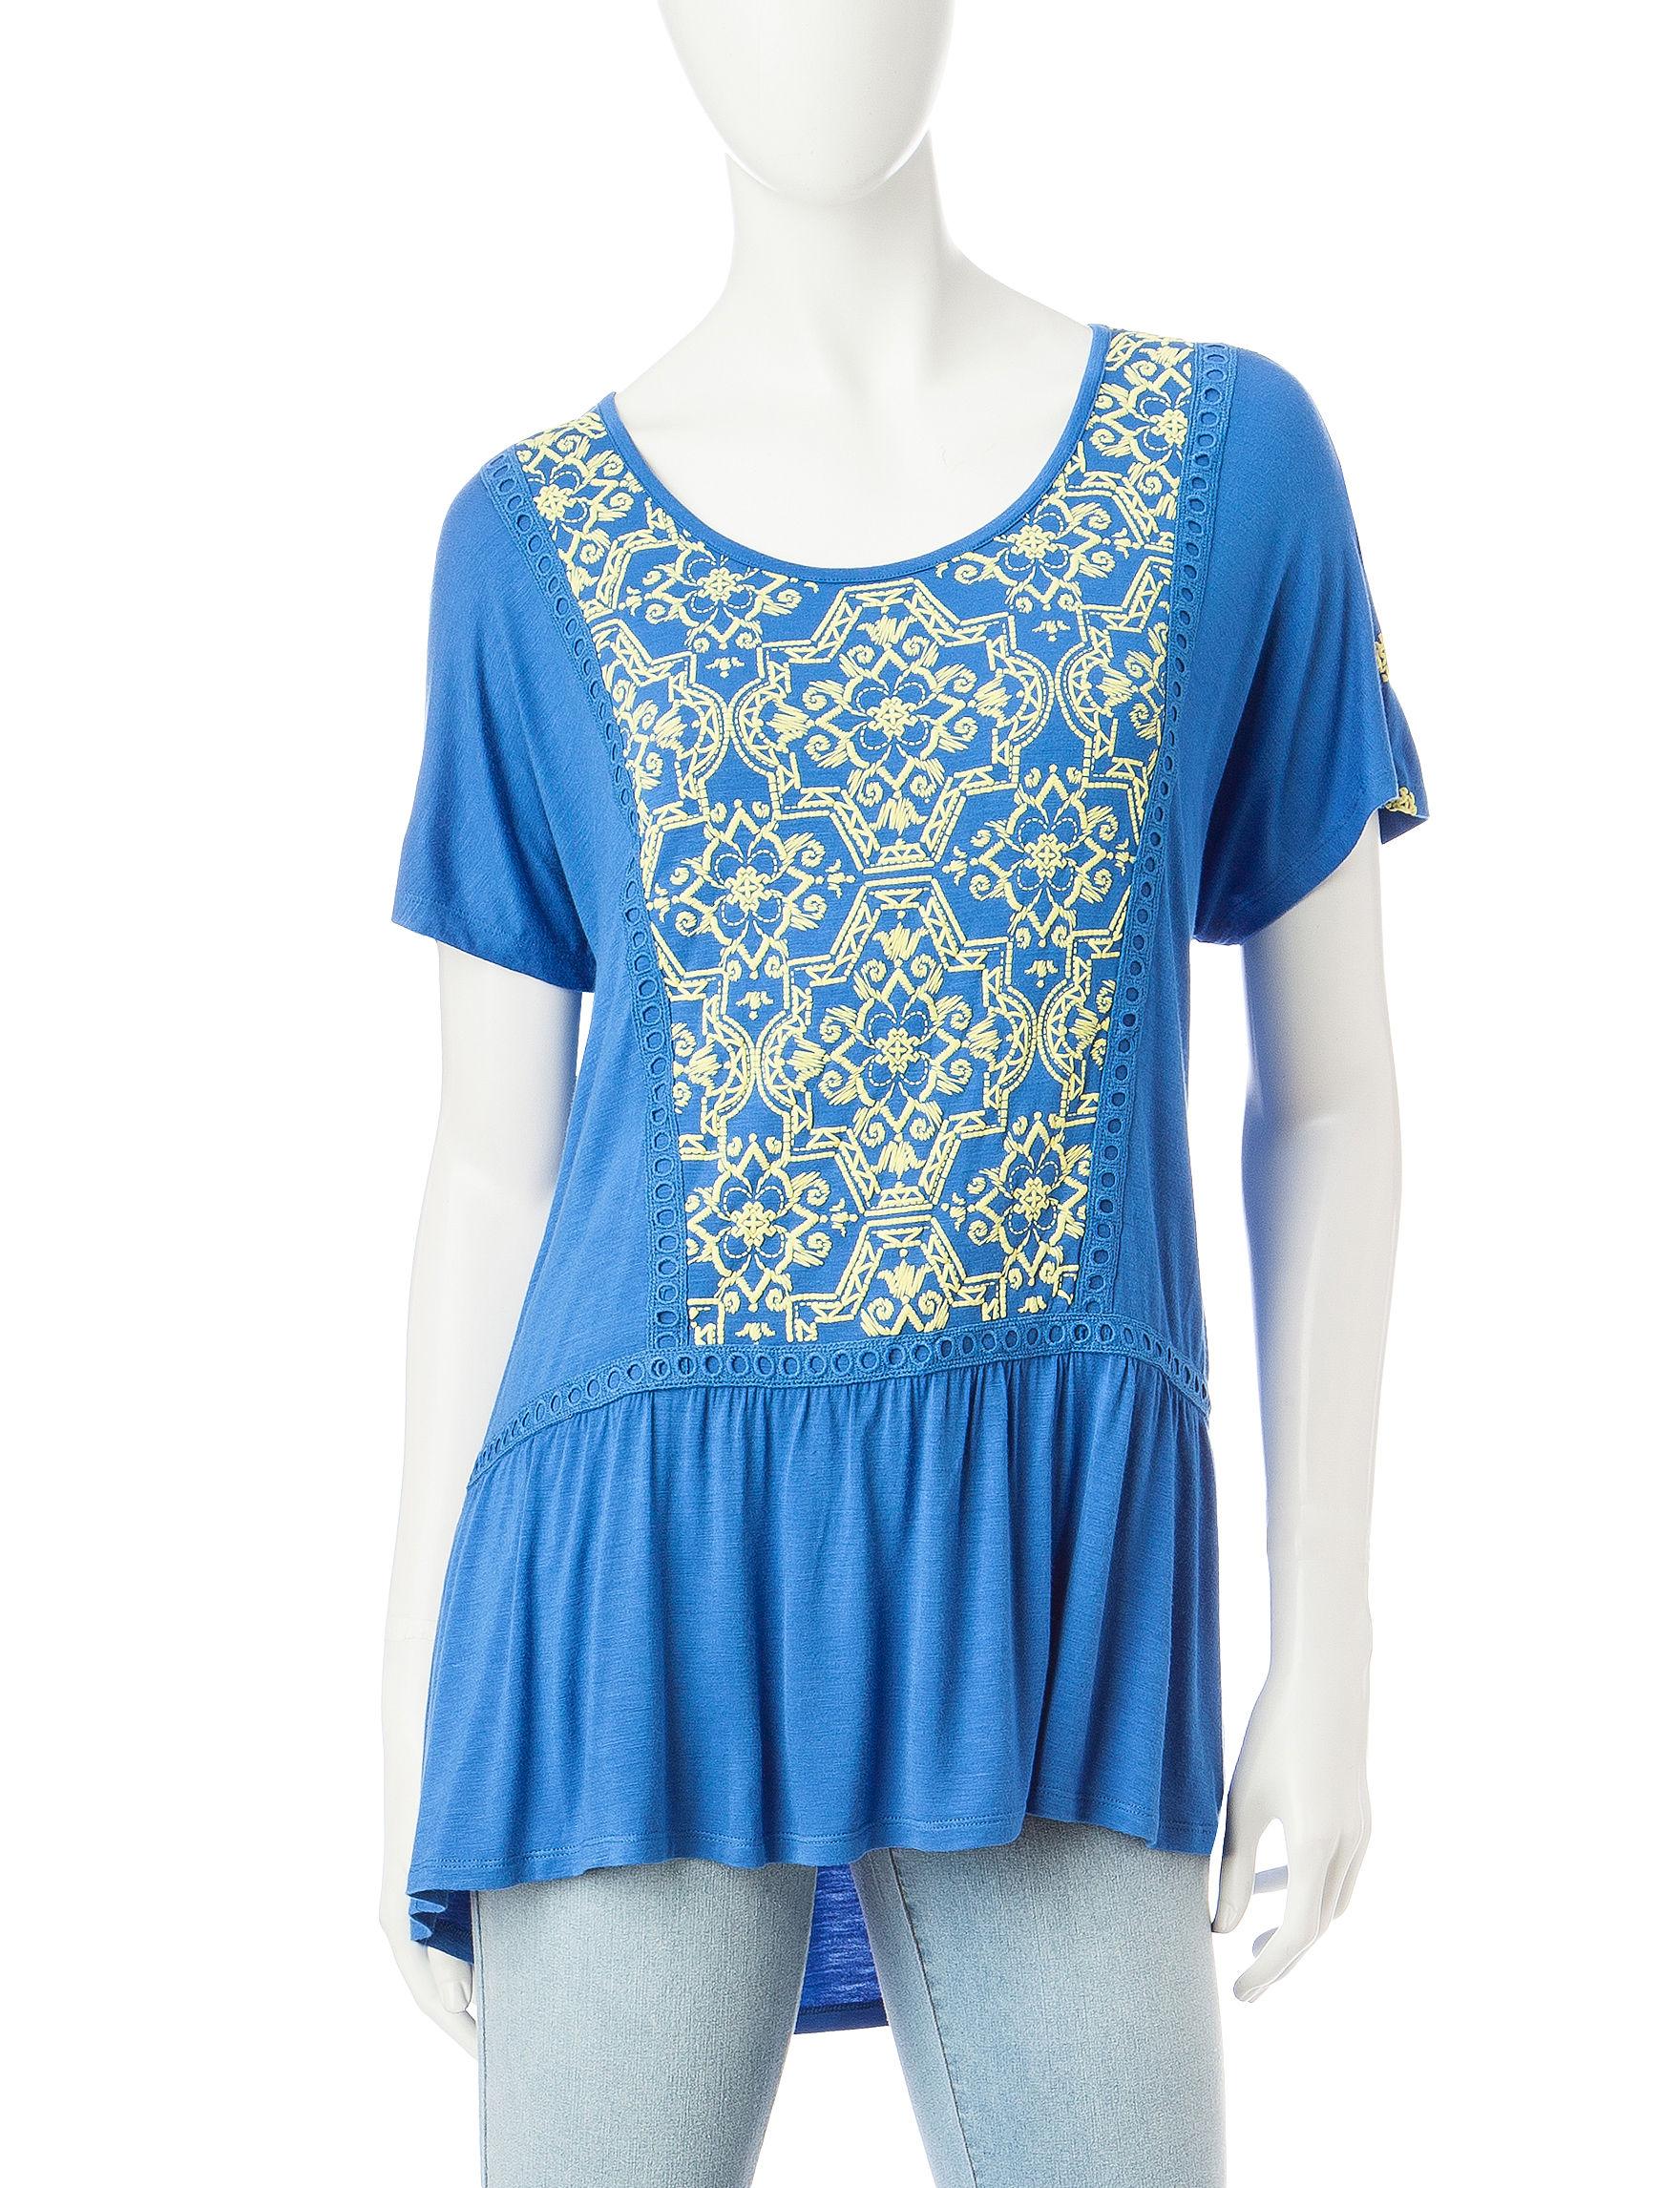 Signature Studio Palace Blue Shirts & Blouses